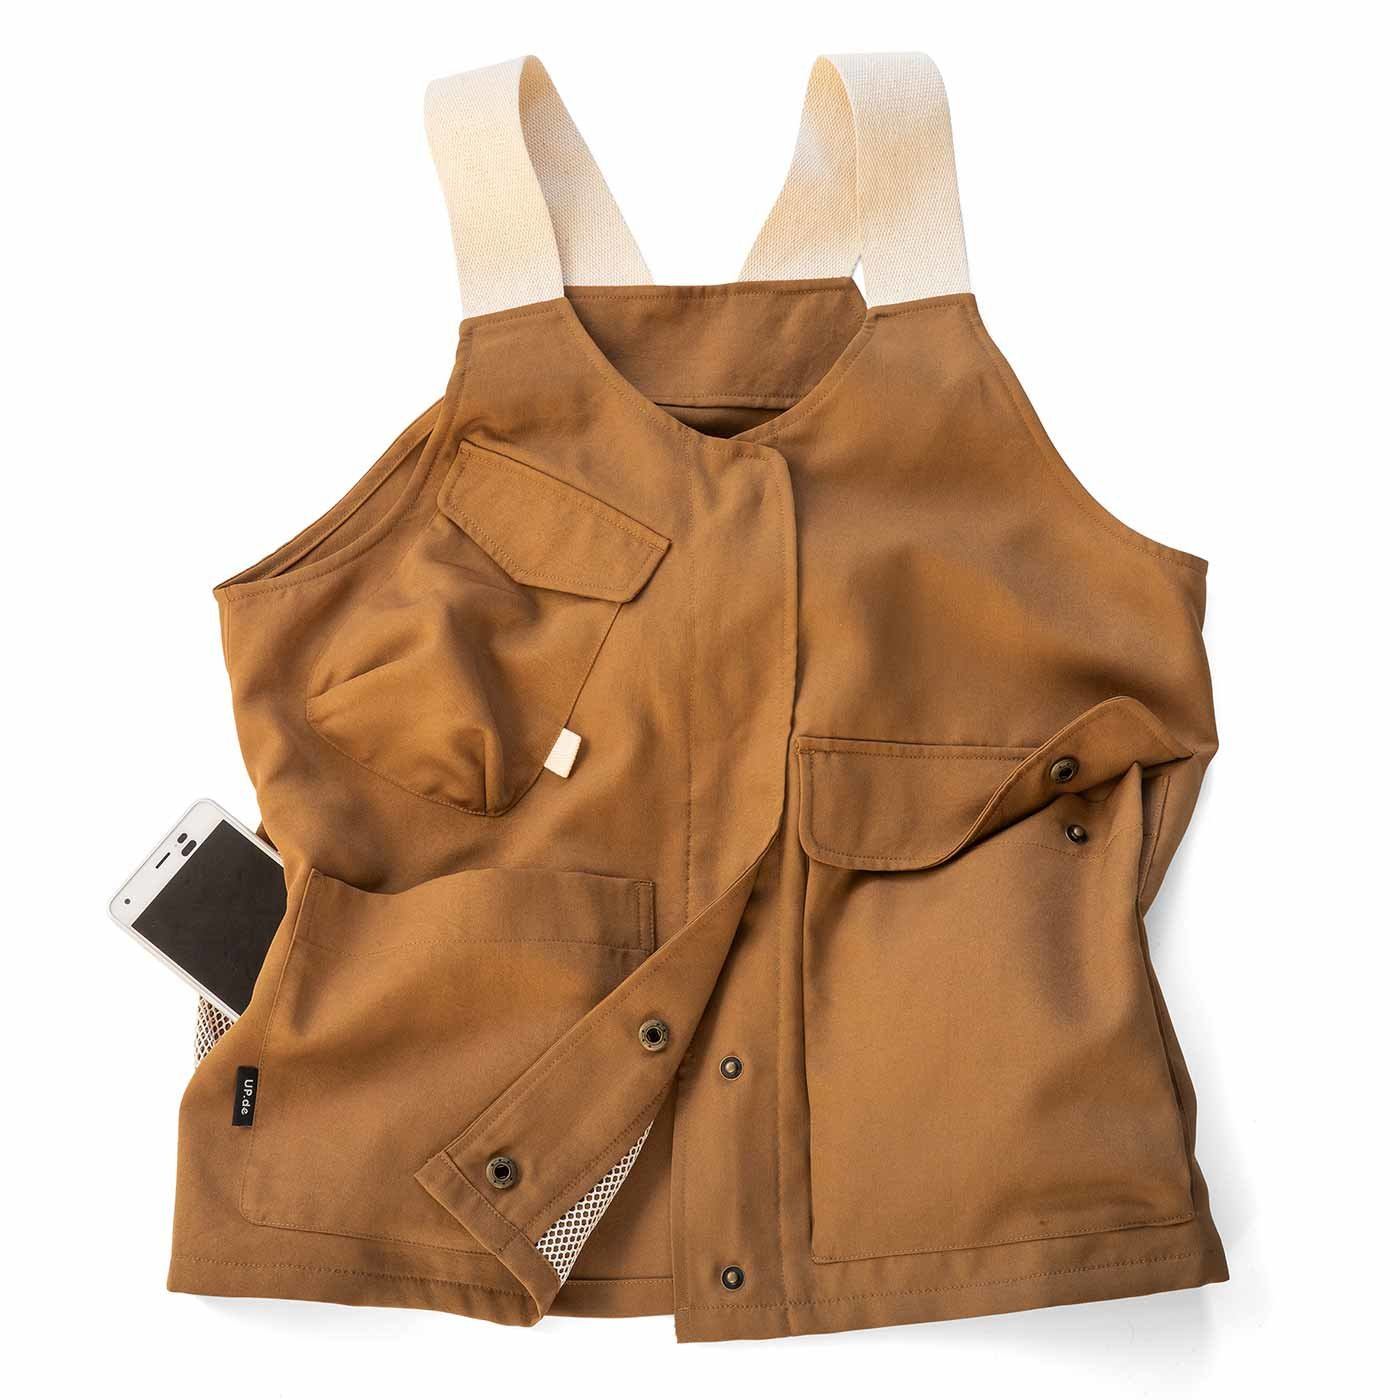 UP.de 着られるバッグで身軽にお出かけ マルチポケットベスト〈キャメル〉